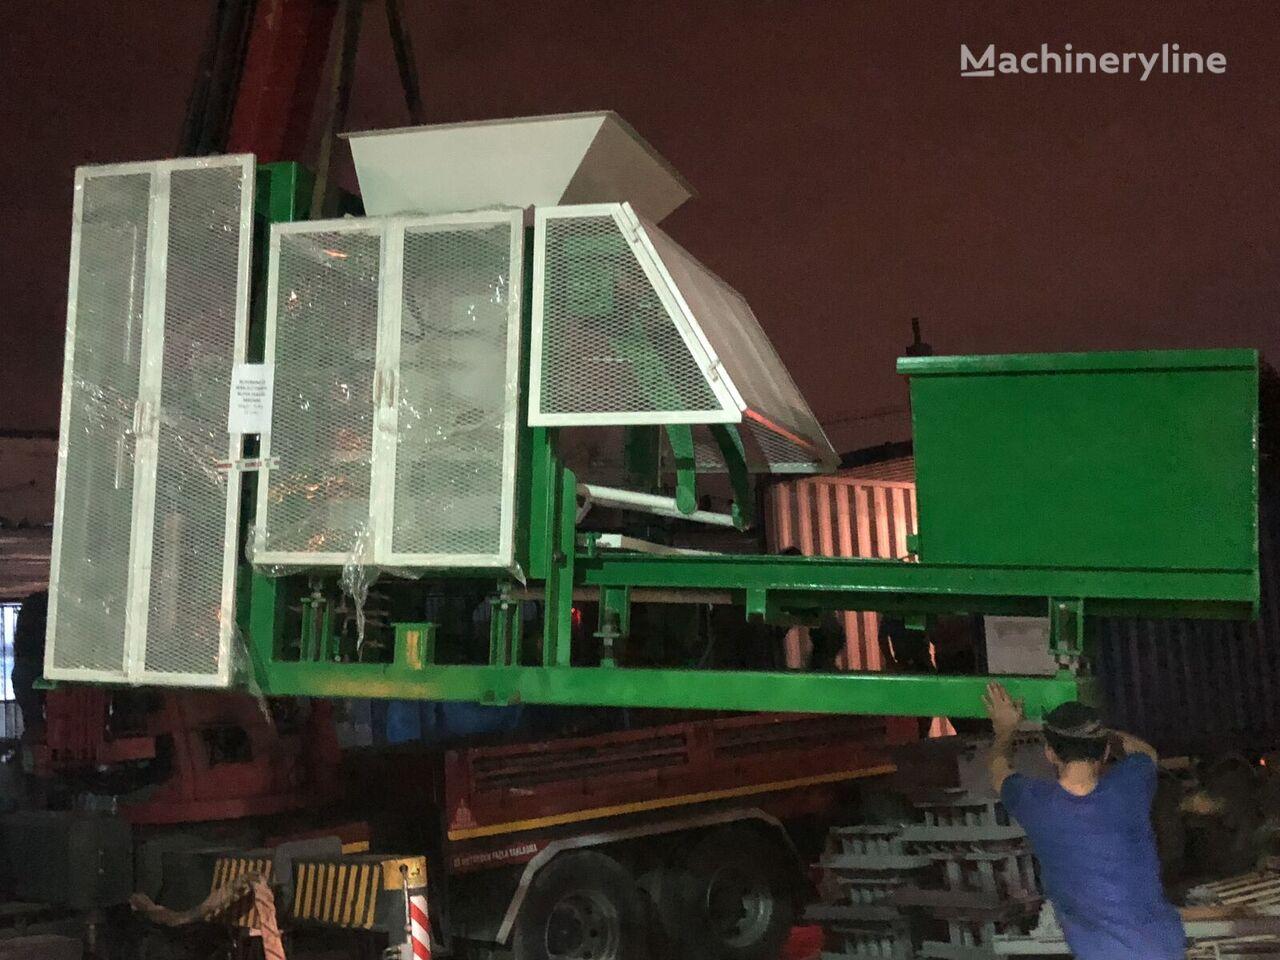 nieuw CONMACH BlockKing-20MS betonblok machine